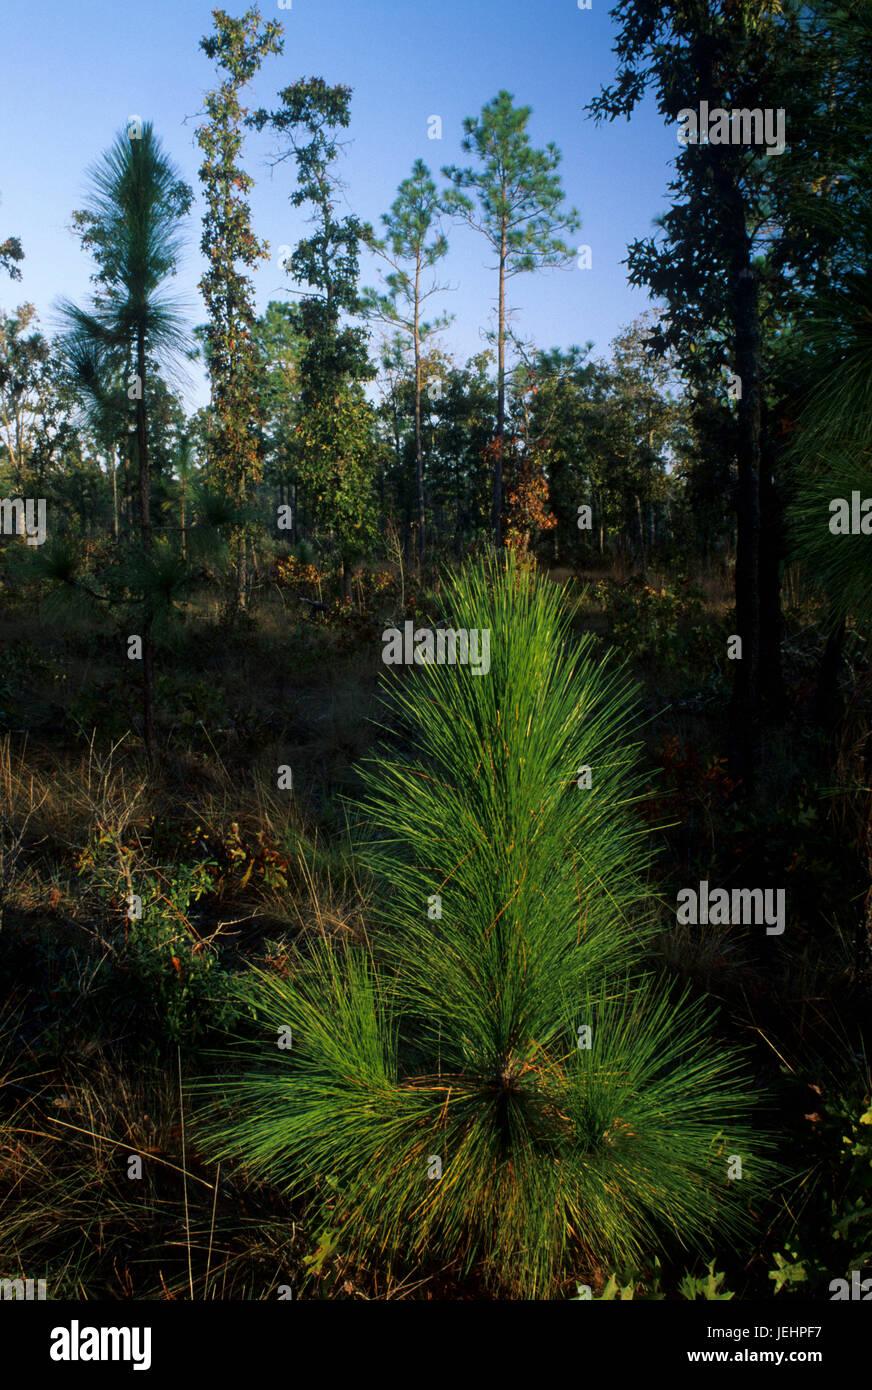 Pine seedling, Apalachicola Bluffs and Ravines Preserve, Florida - Stock Image